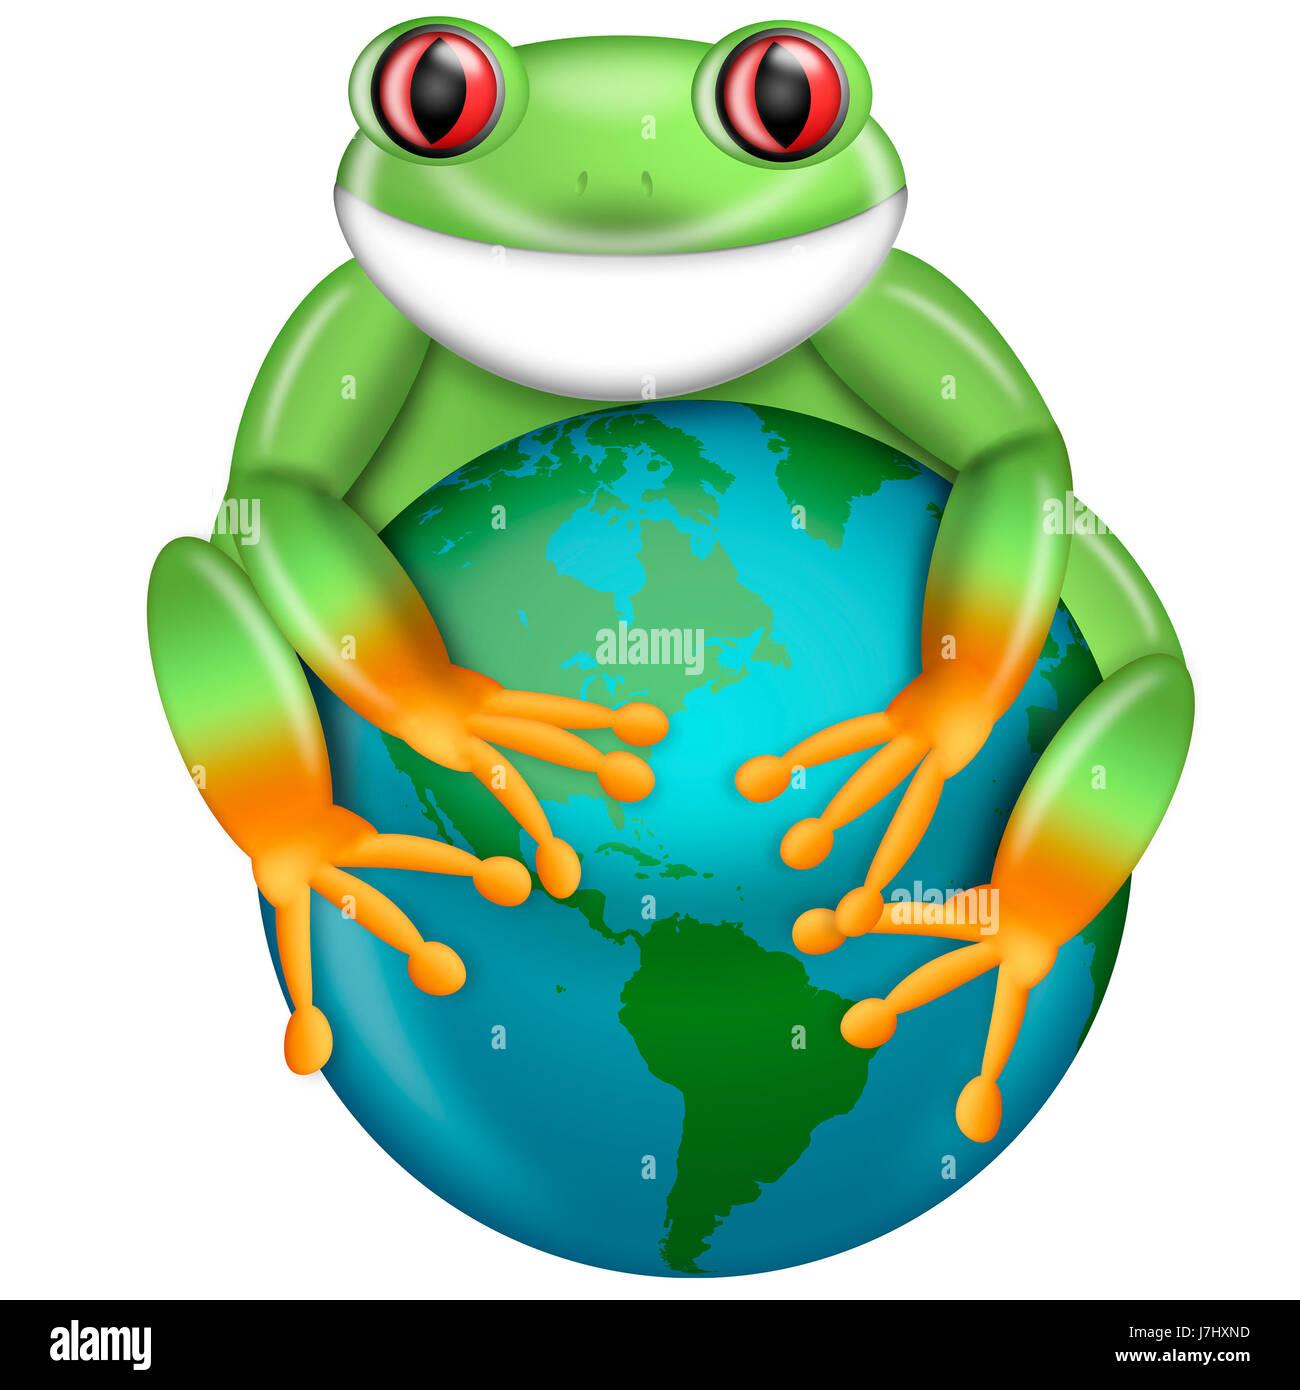 Amphibian globe planet earth world global amazon map atlas map of amphibian globe planet earth world global amazon map atlas map of the world gumiabroncs Image collections